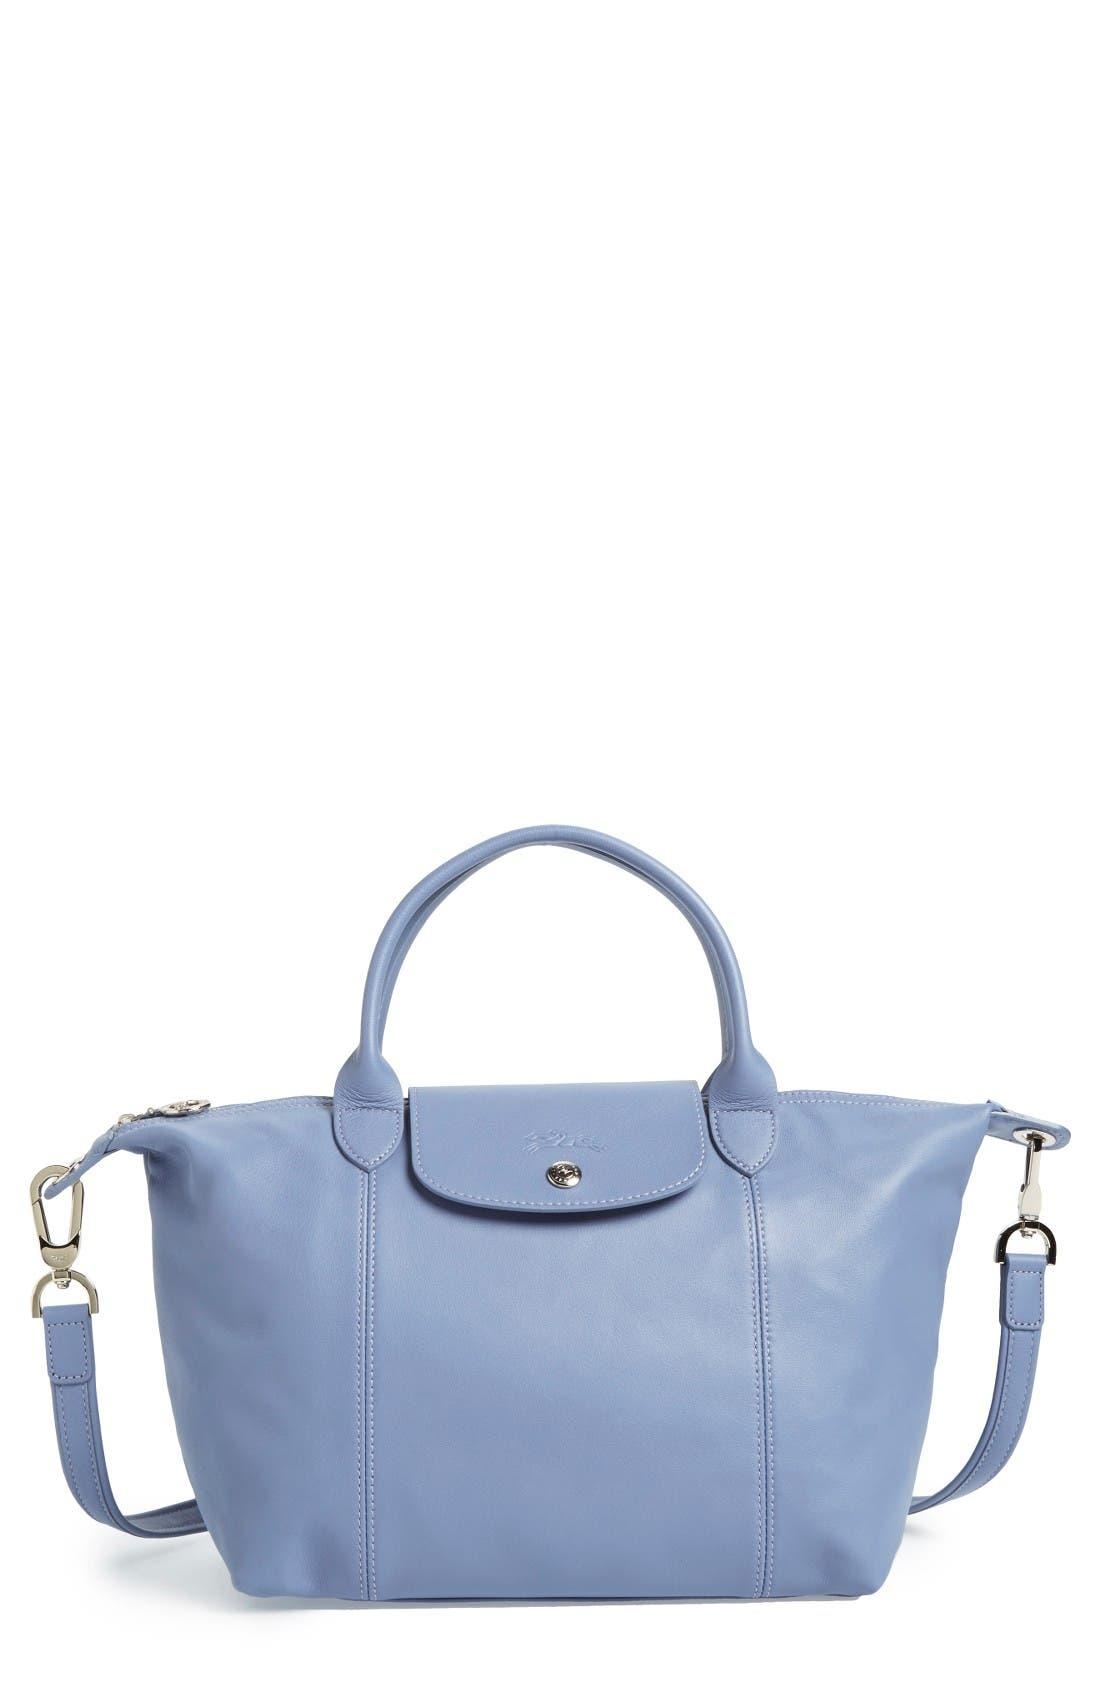 Main Image - Longchamp 'Le Pliage Cuir' Leather Handbag